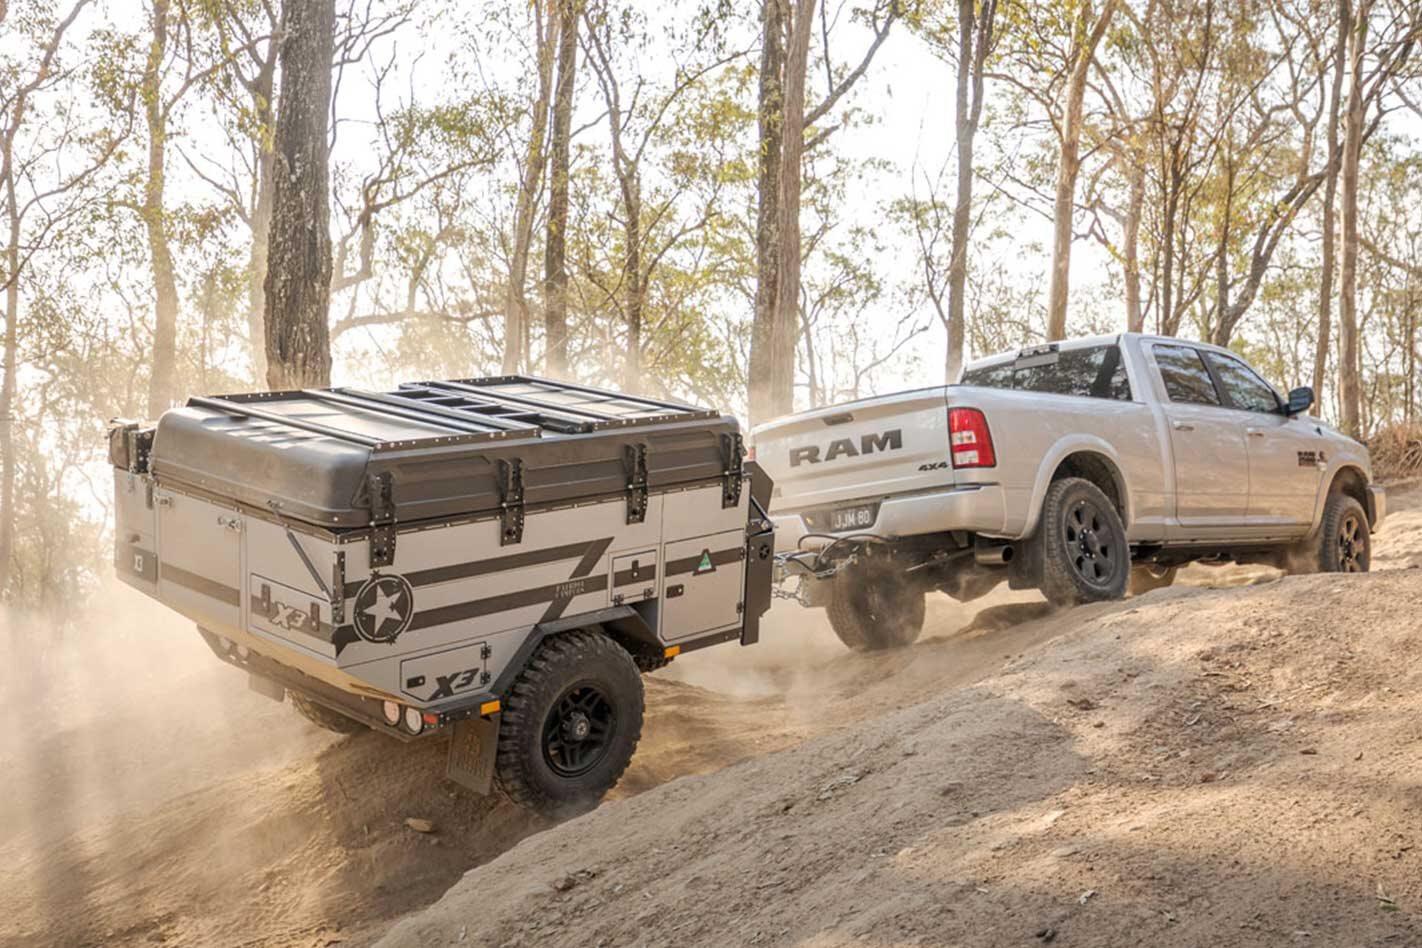 Patriot Campers X3 camper trailer introduced